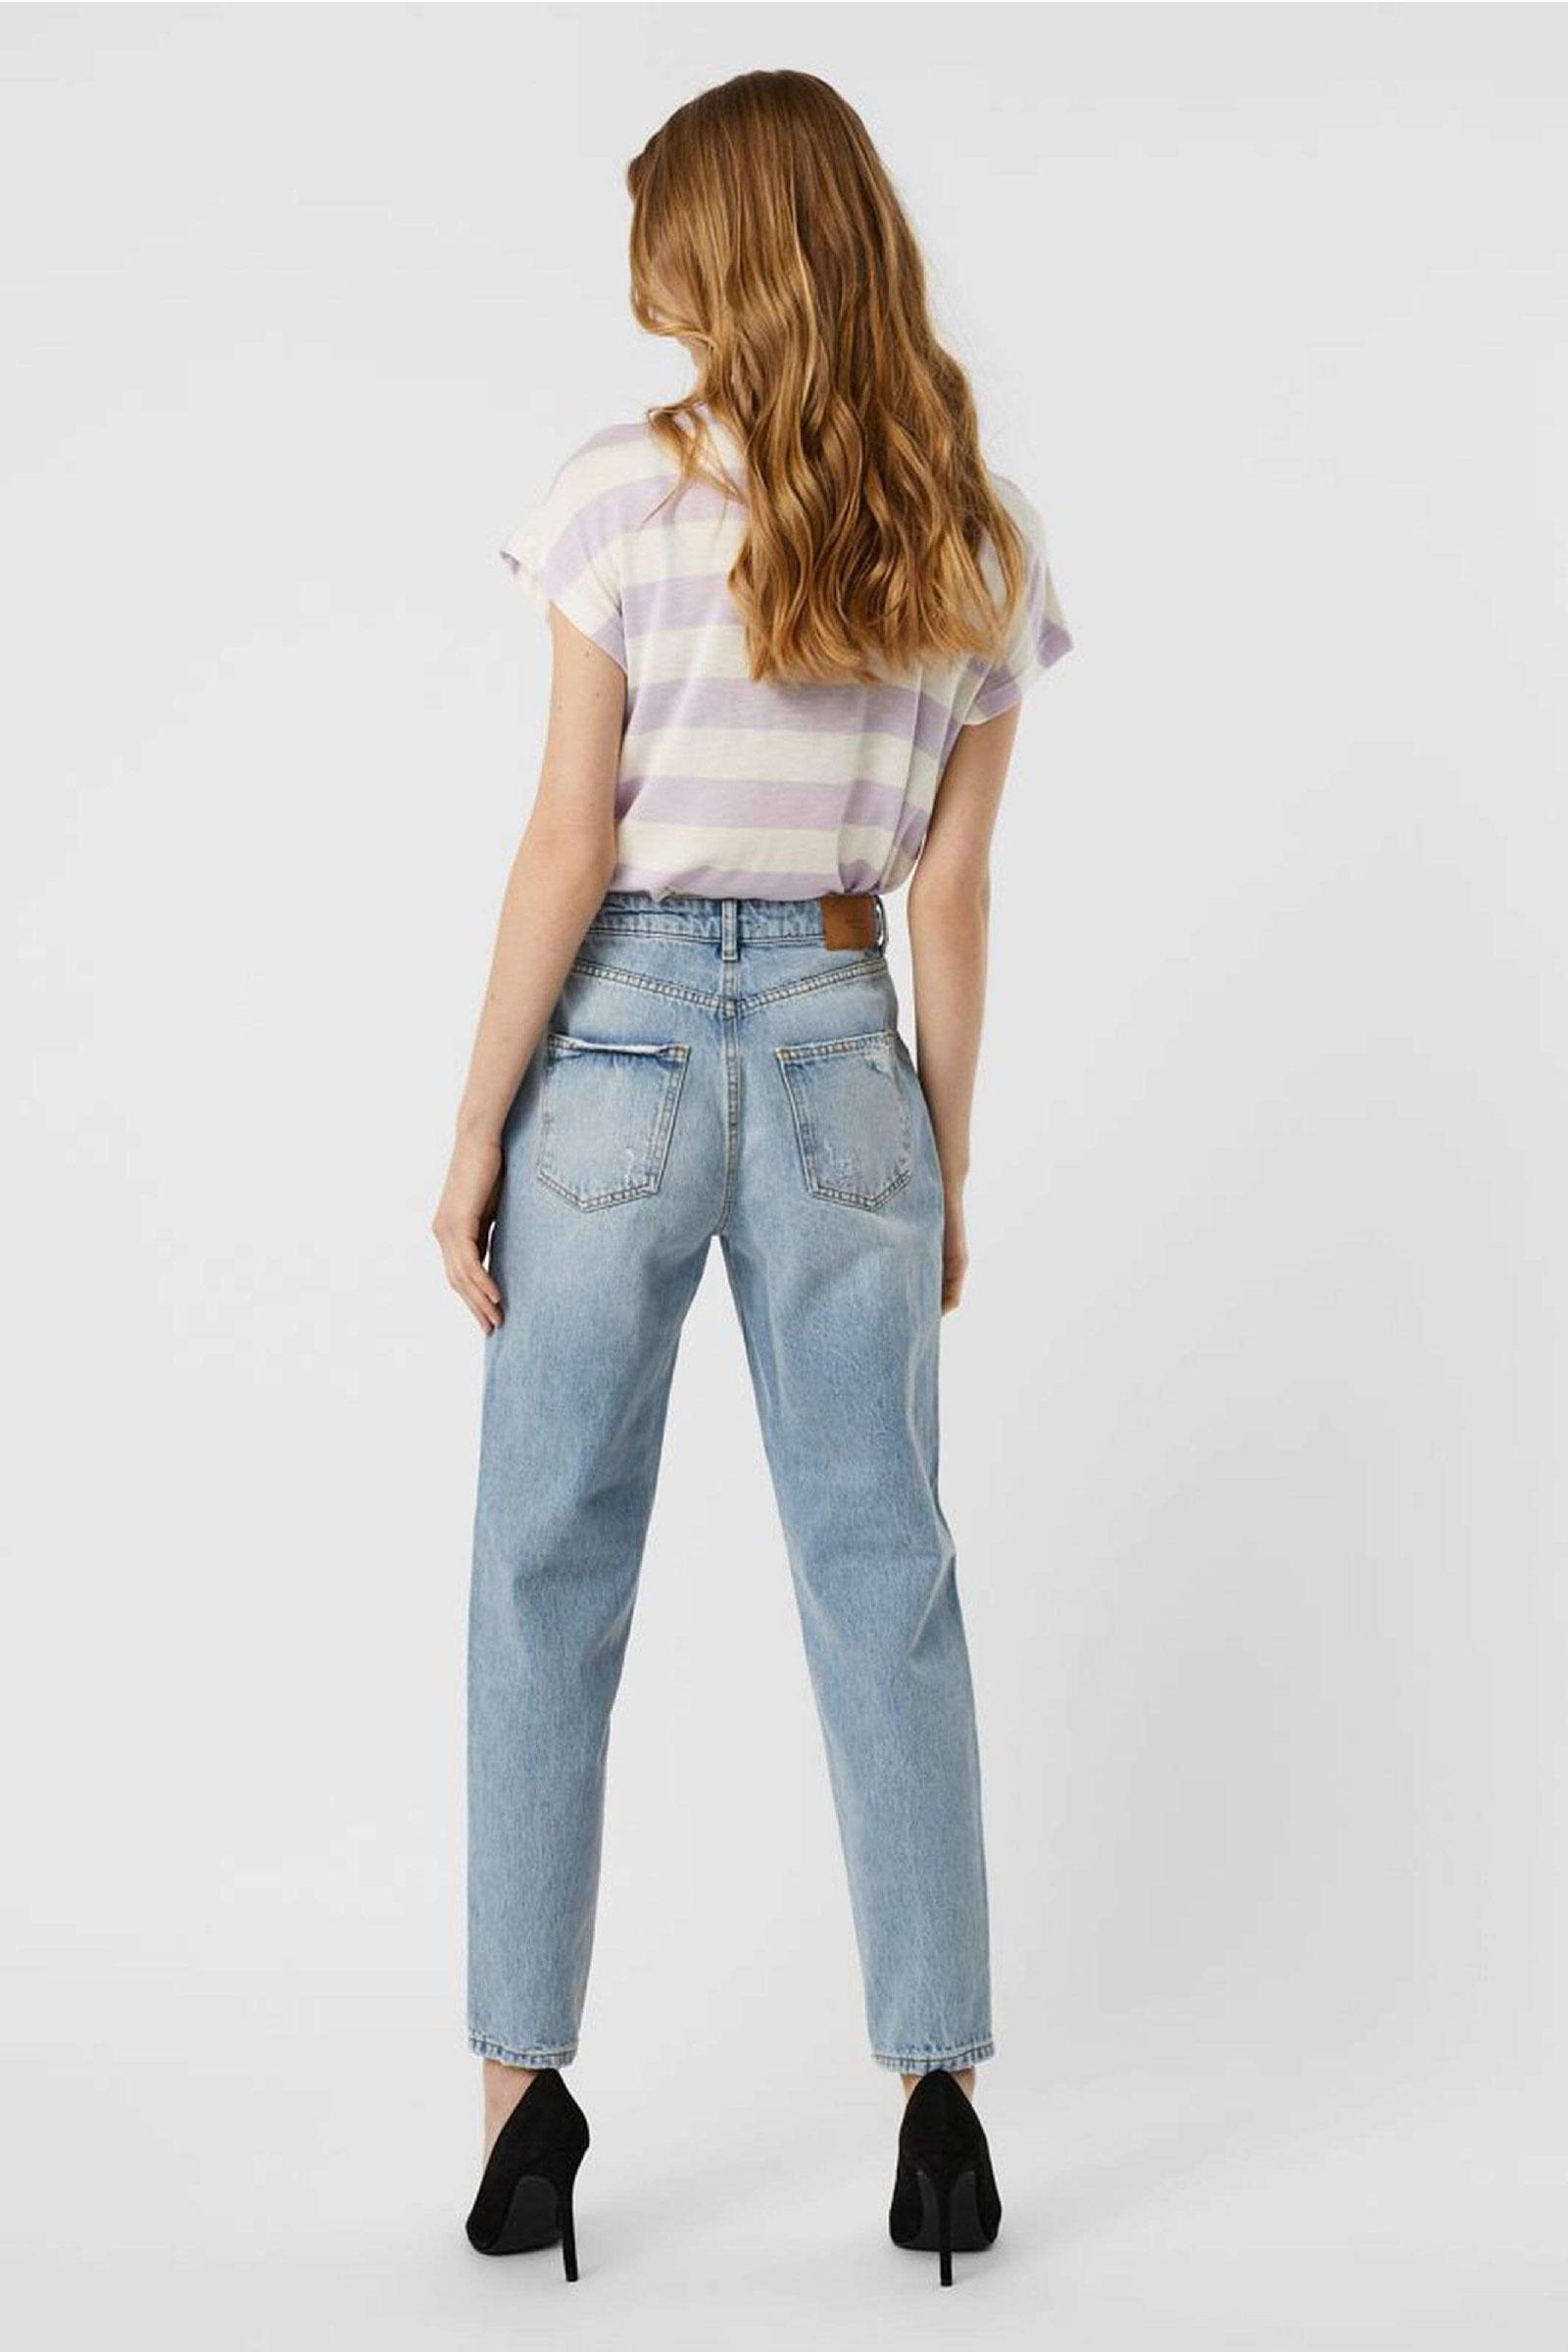 VERO MODA Jeans Donna VERO MODA | Jeans | 10248063Medium Blue Denim